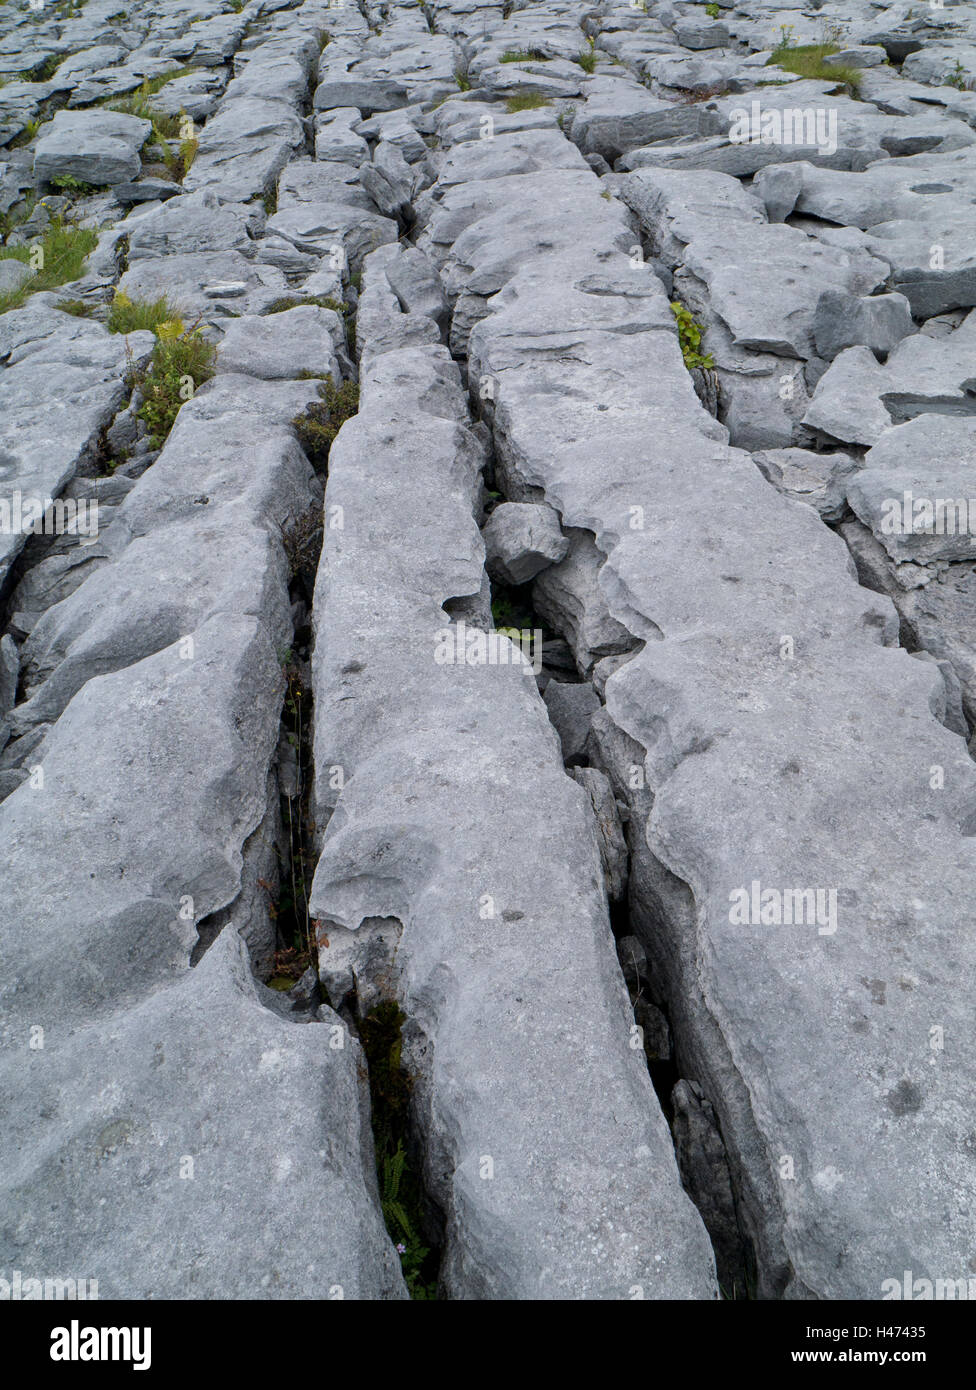 Limestone pavement in the Burren, County Clare - Stock Image